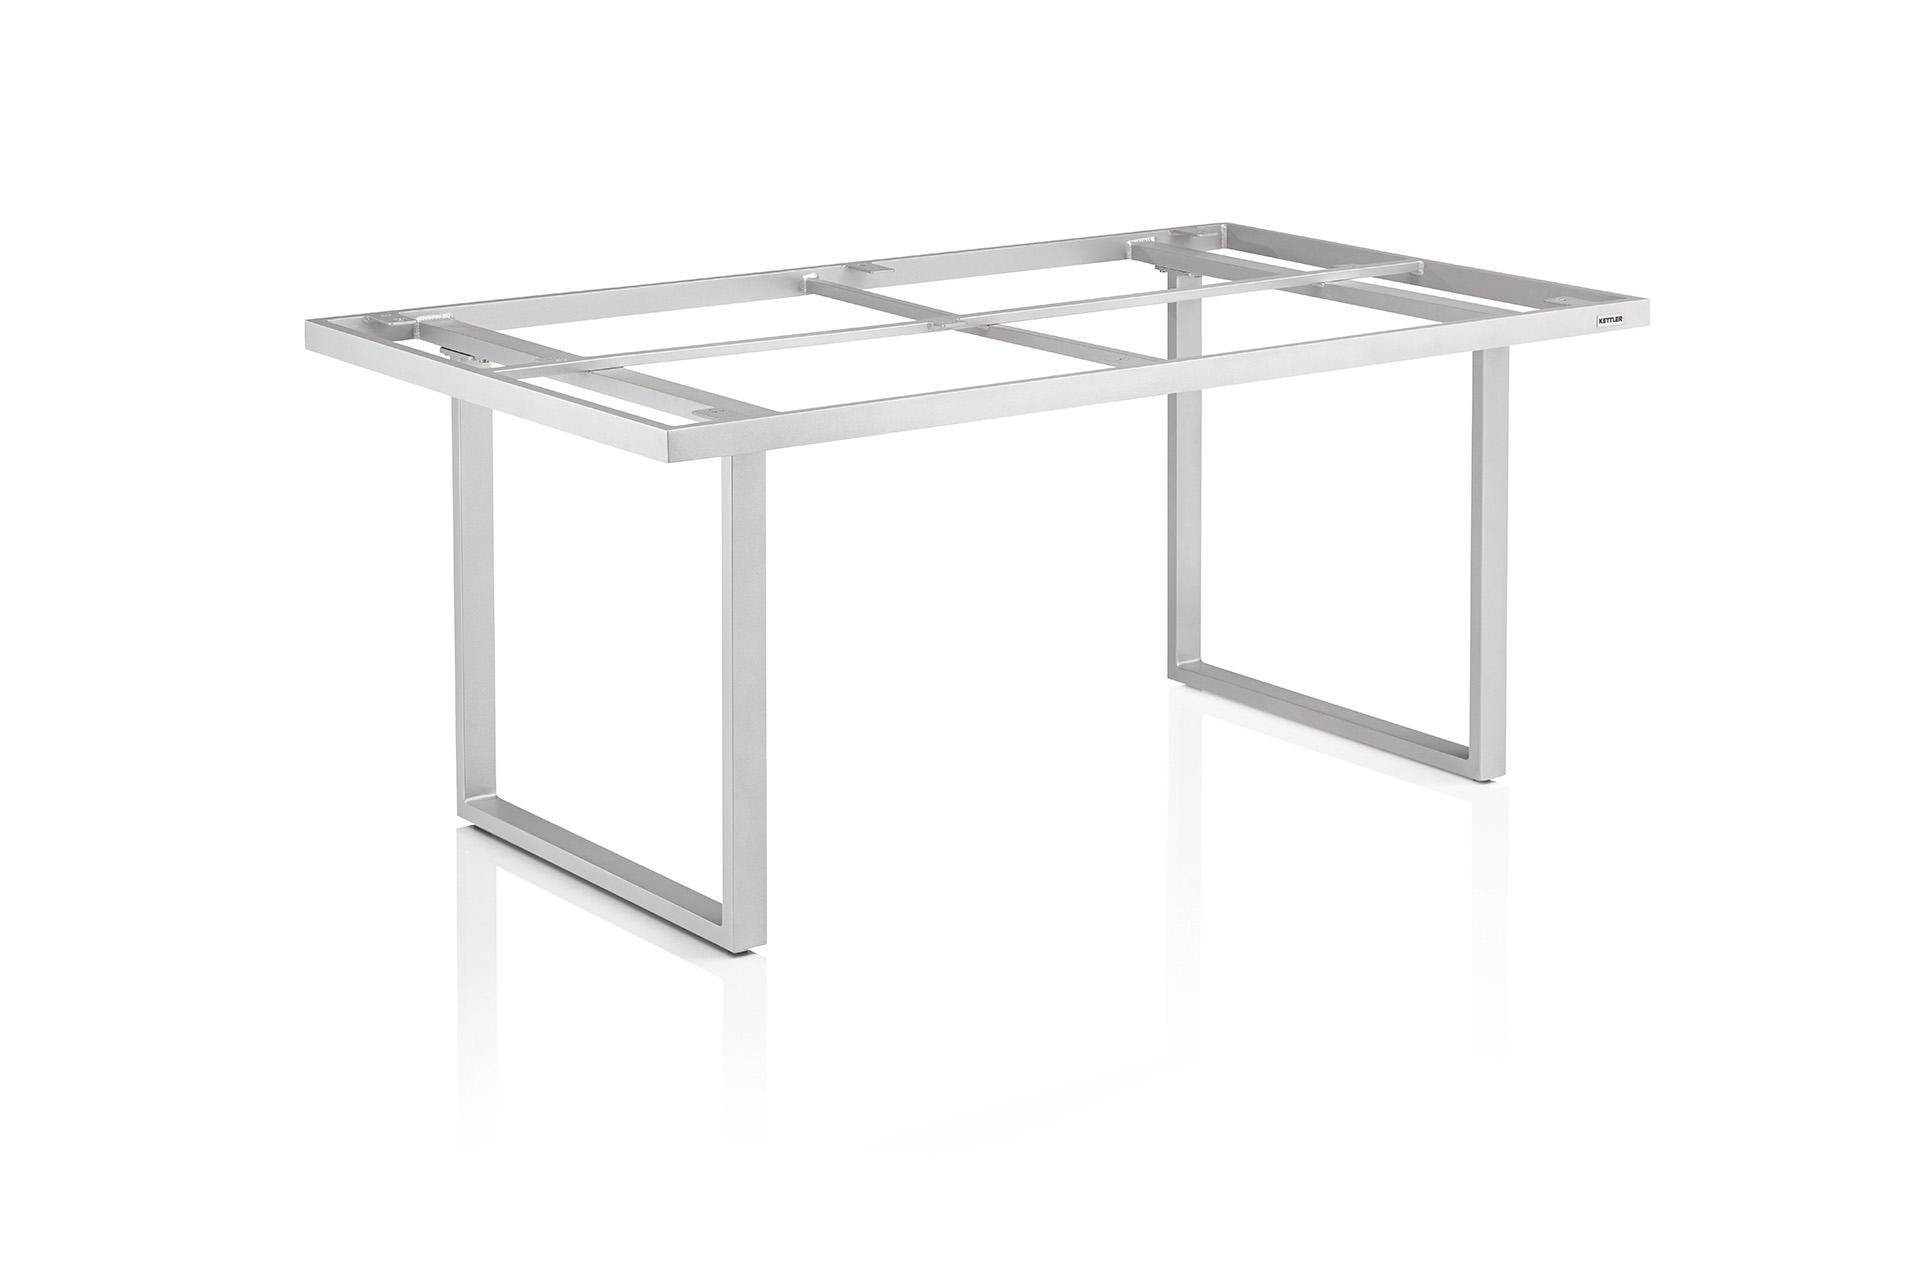 EGO Dining Casual Tischgestell 160 x 95 cm